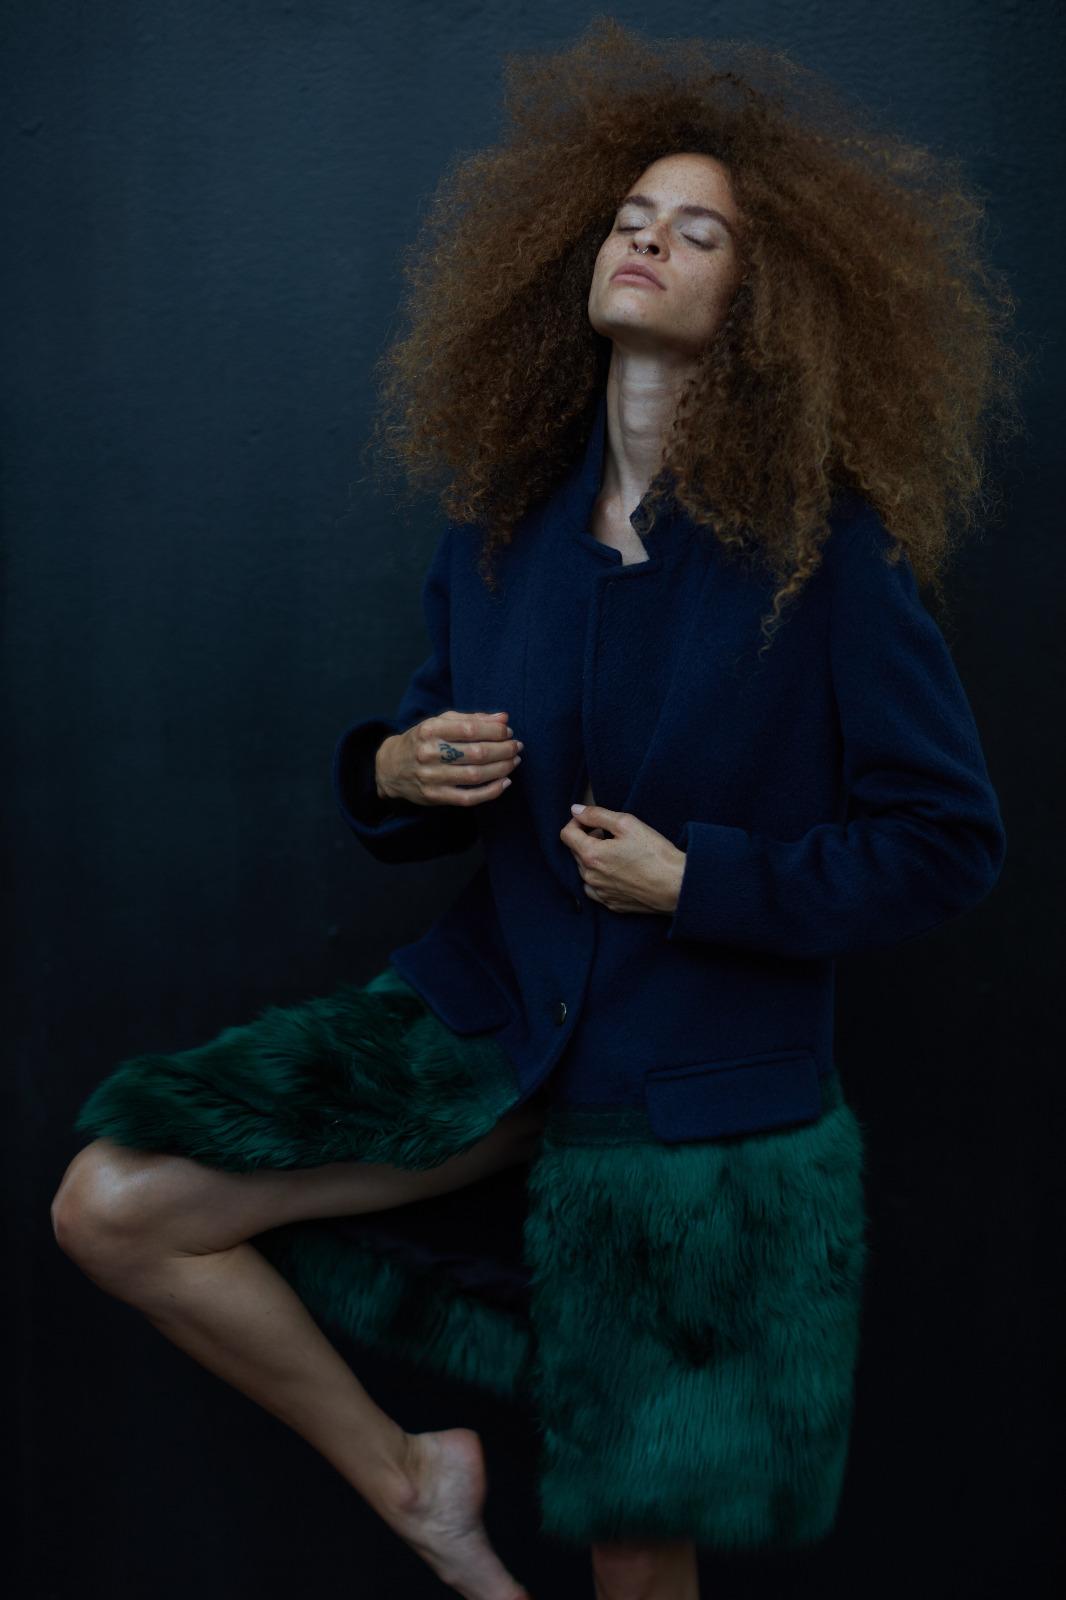 Fashion-editoria-mirko-burin-6-switch-magazine